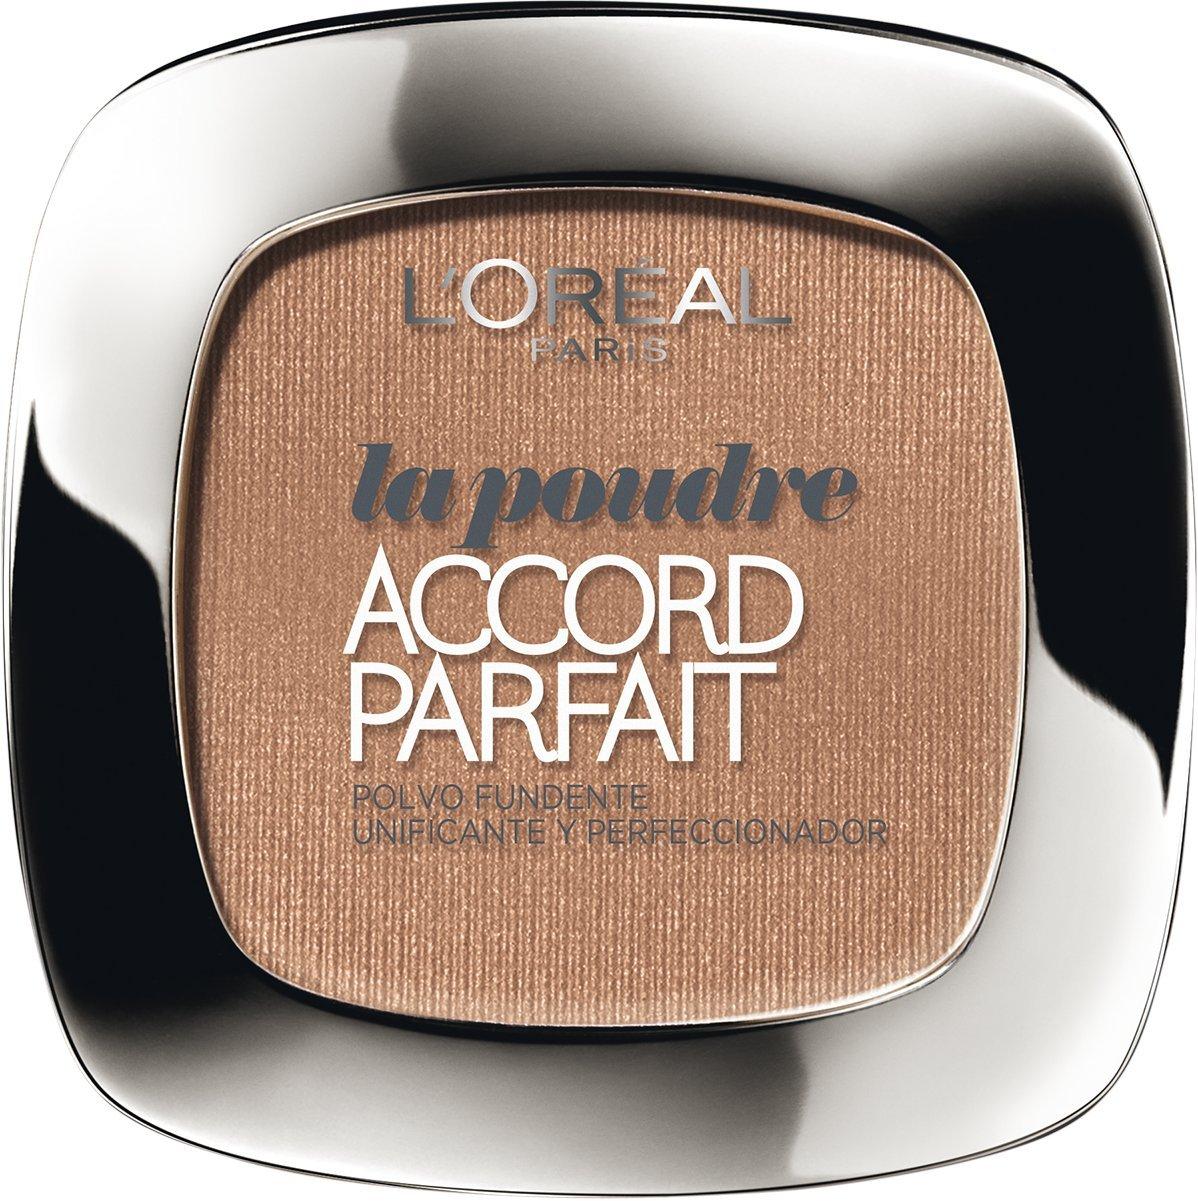 L'Oreal Paris Accord Perfect Polvo Compacto, Tono: Sable Doré D5 L'Oreal 56442